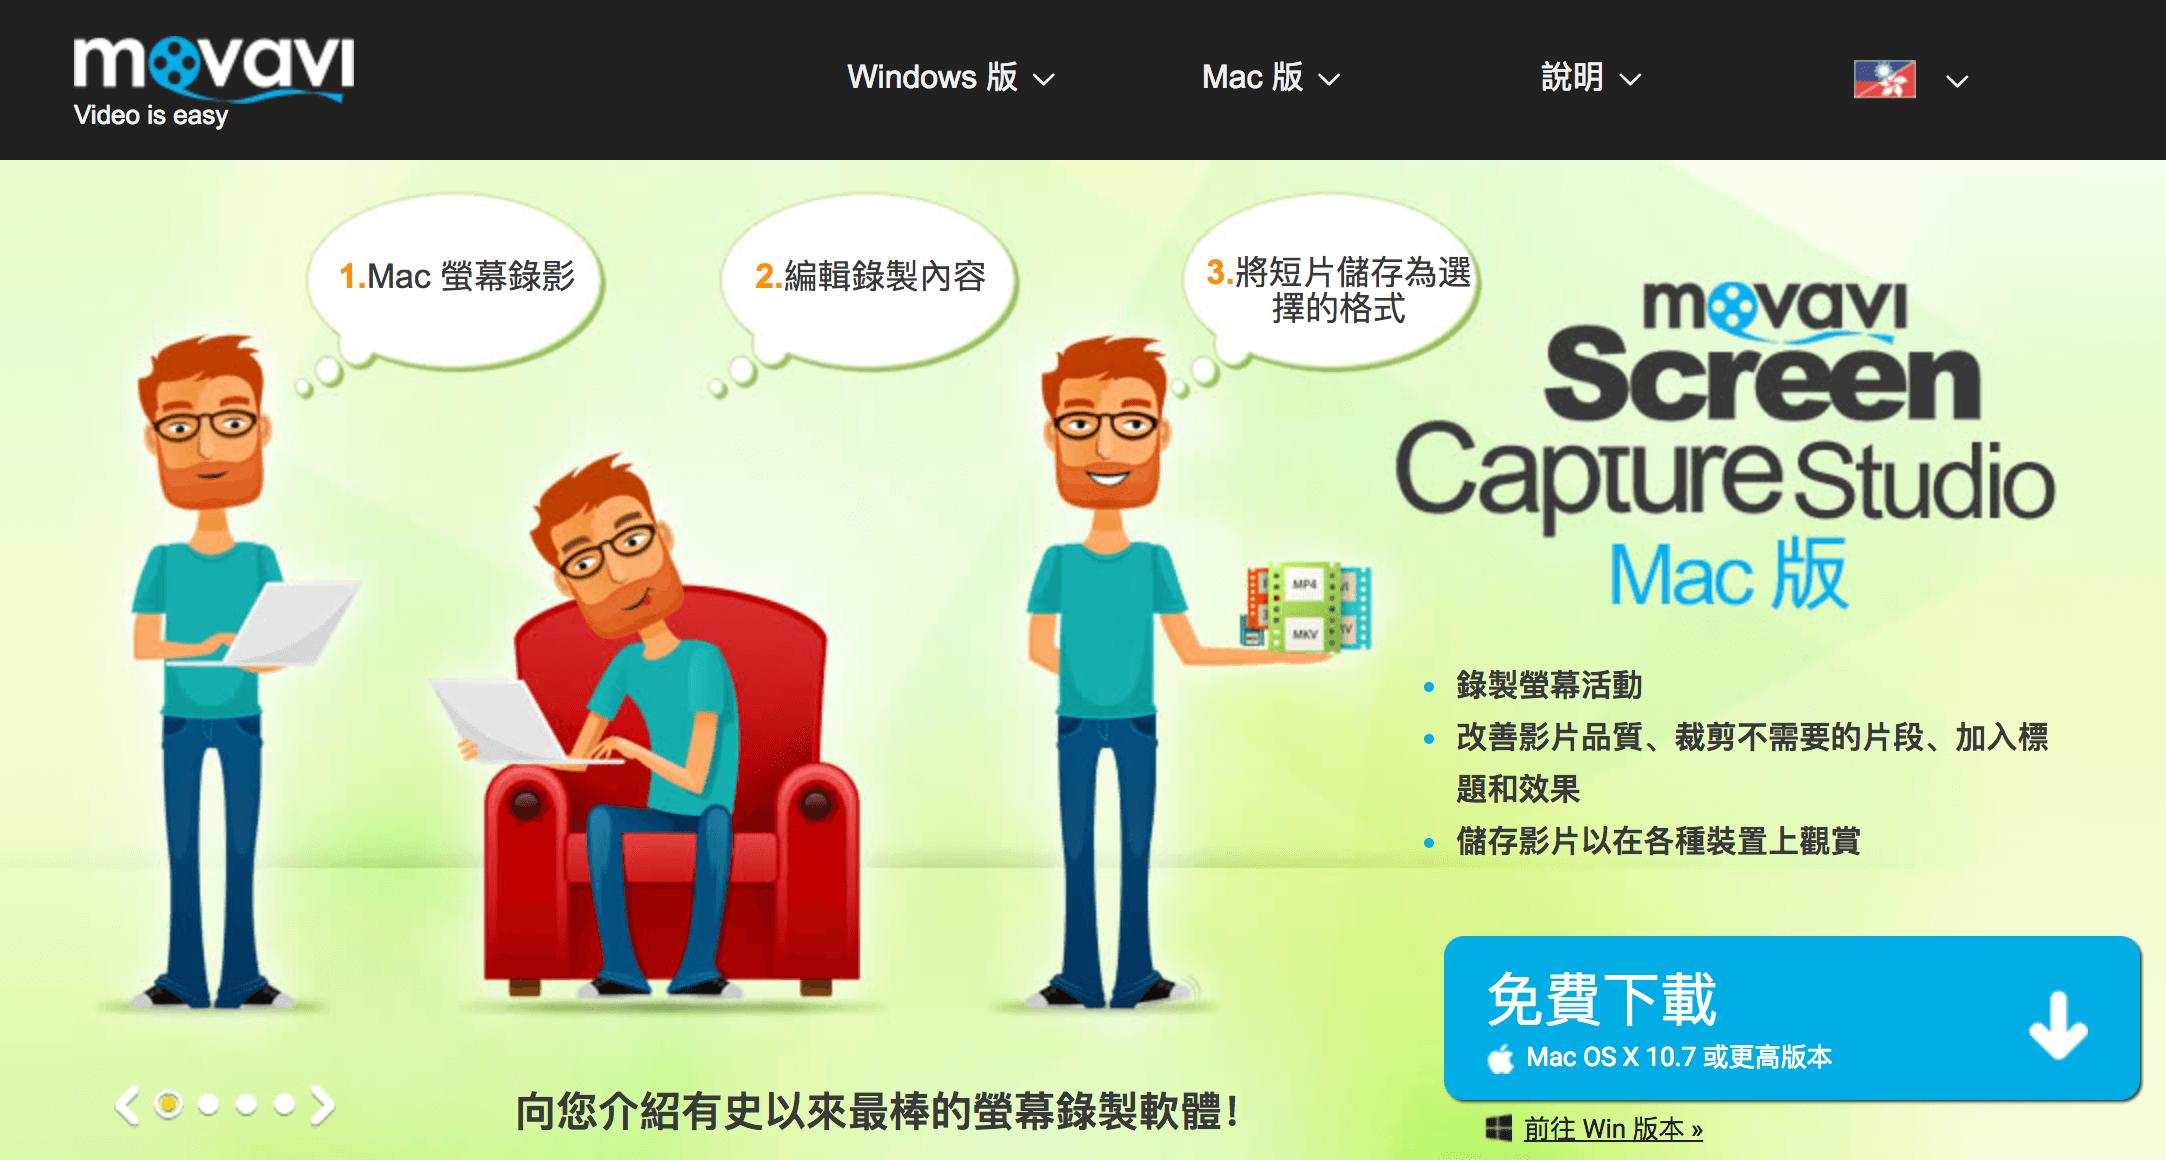 Movavi Screen Capture Studio:輕易上手的螢幕錄製軟體